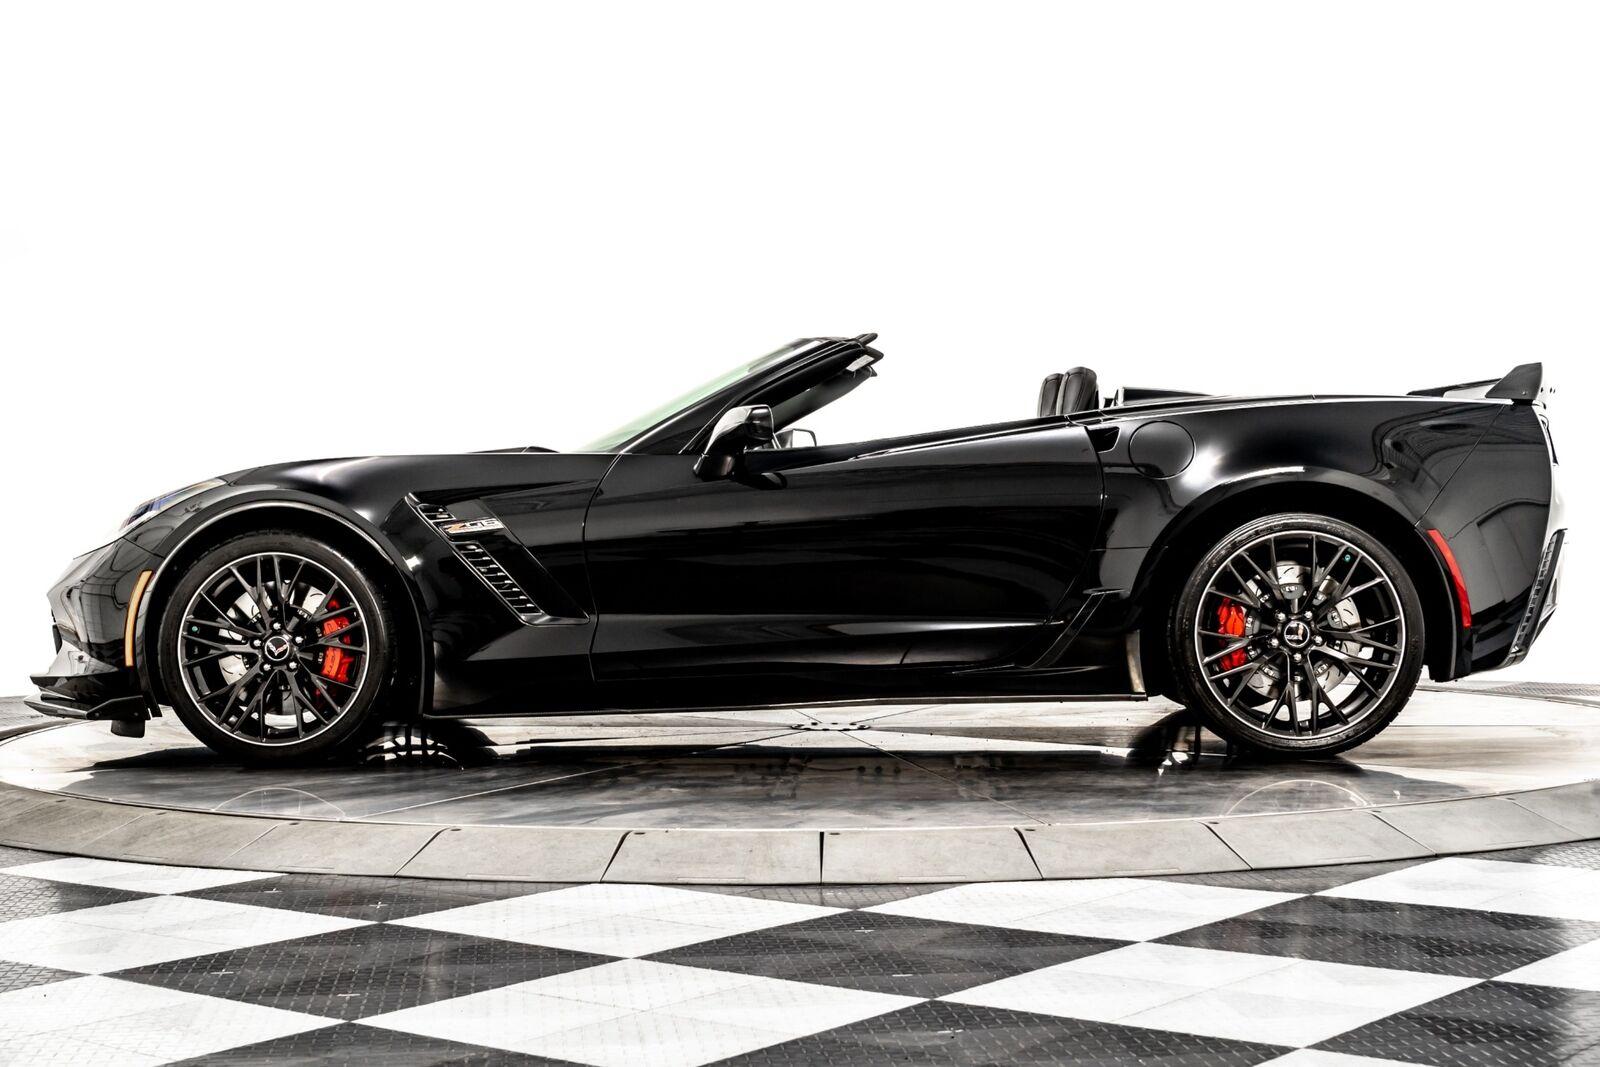 2015 Black Chevrolet Corvette Z06 3LZ   C7 Corvette Photo 5